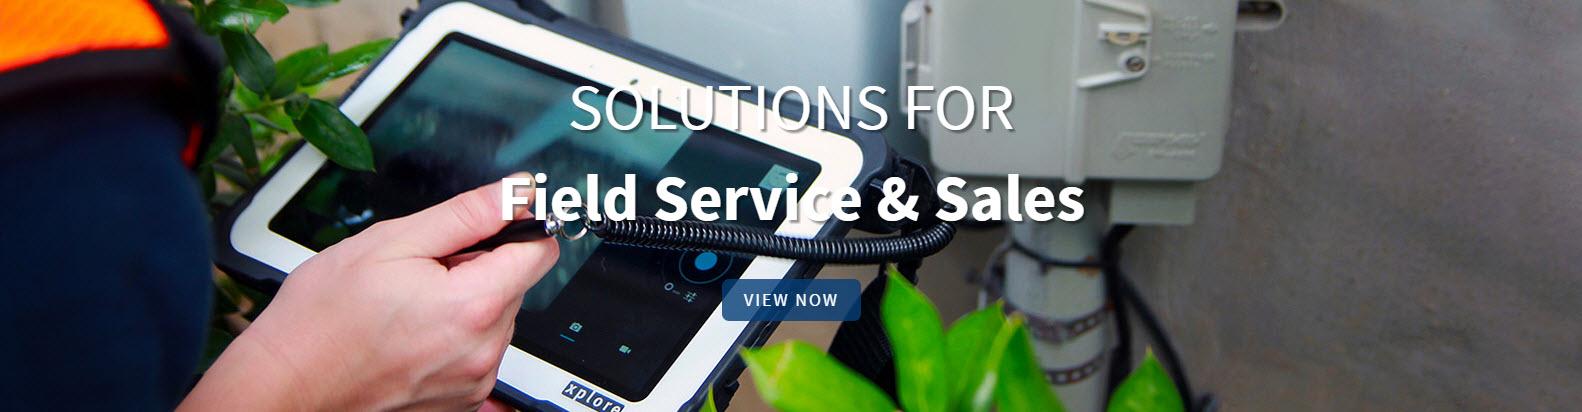 Field Service & Sales